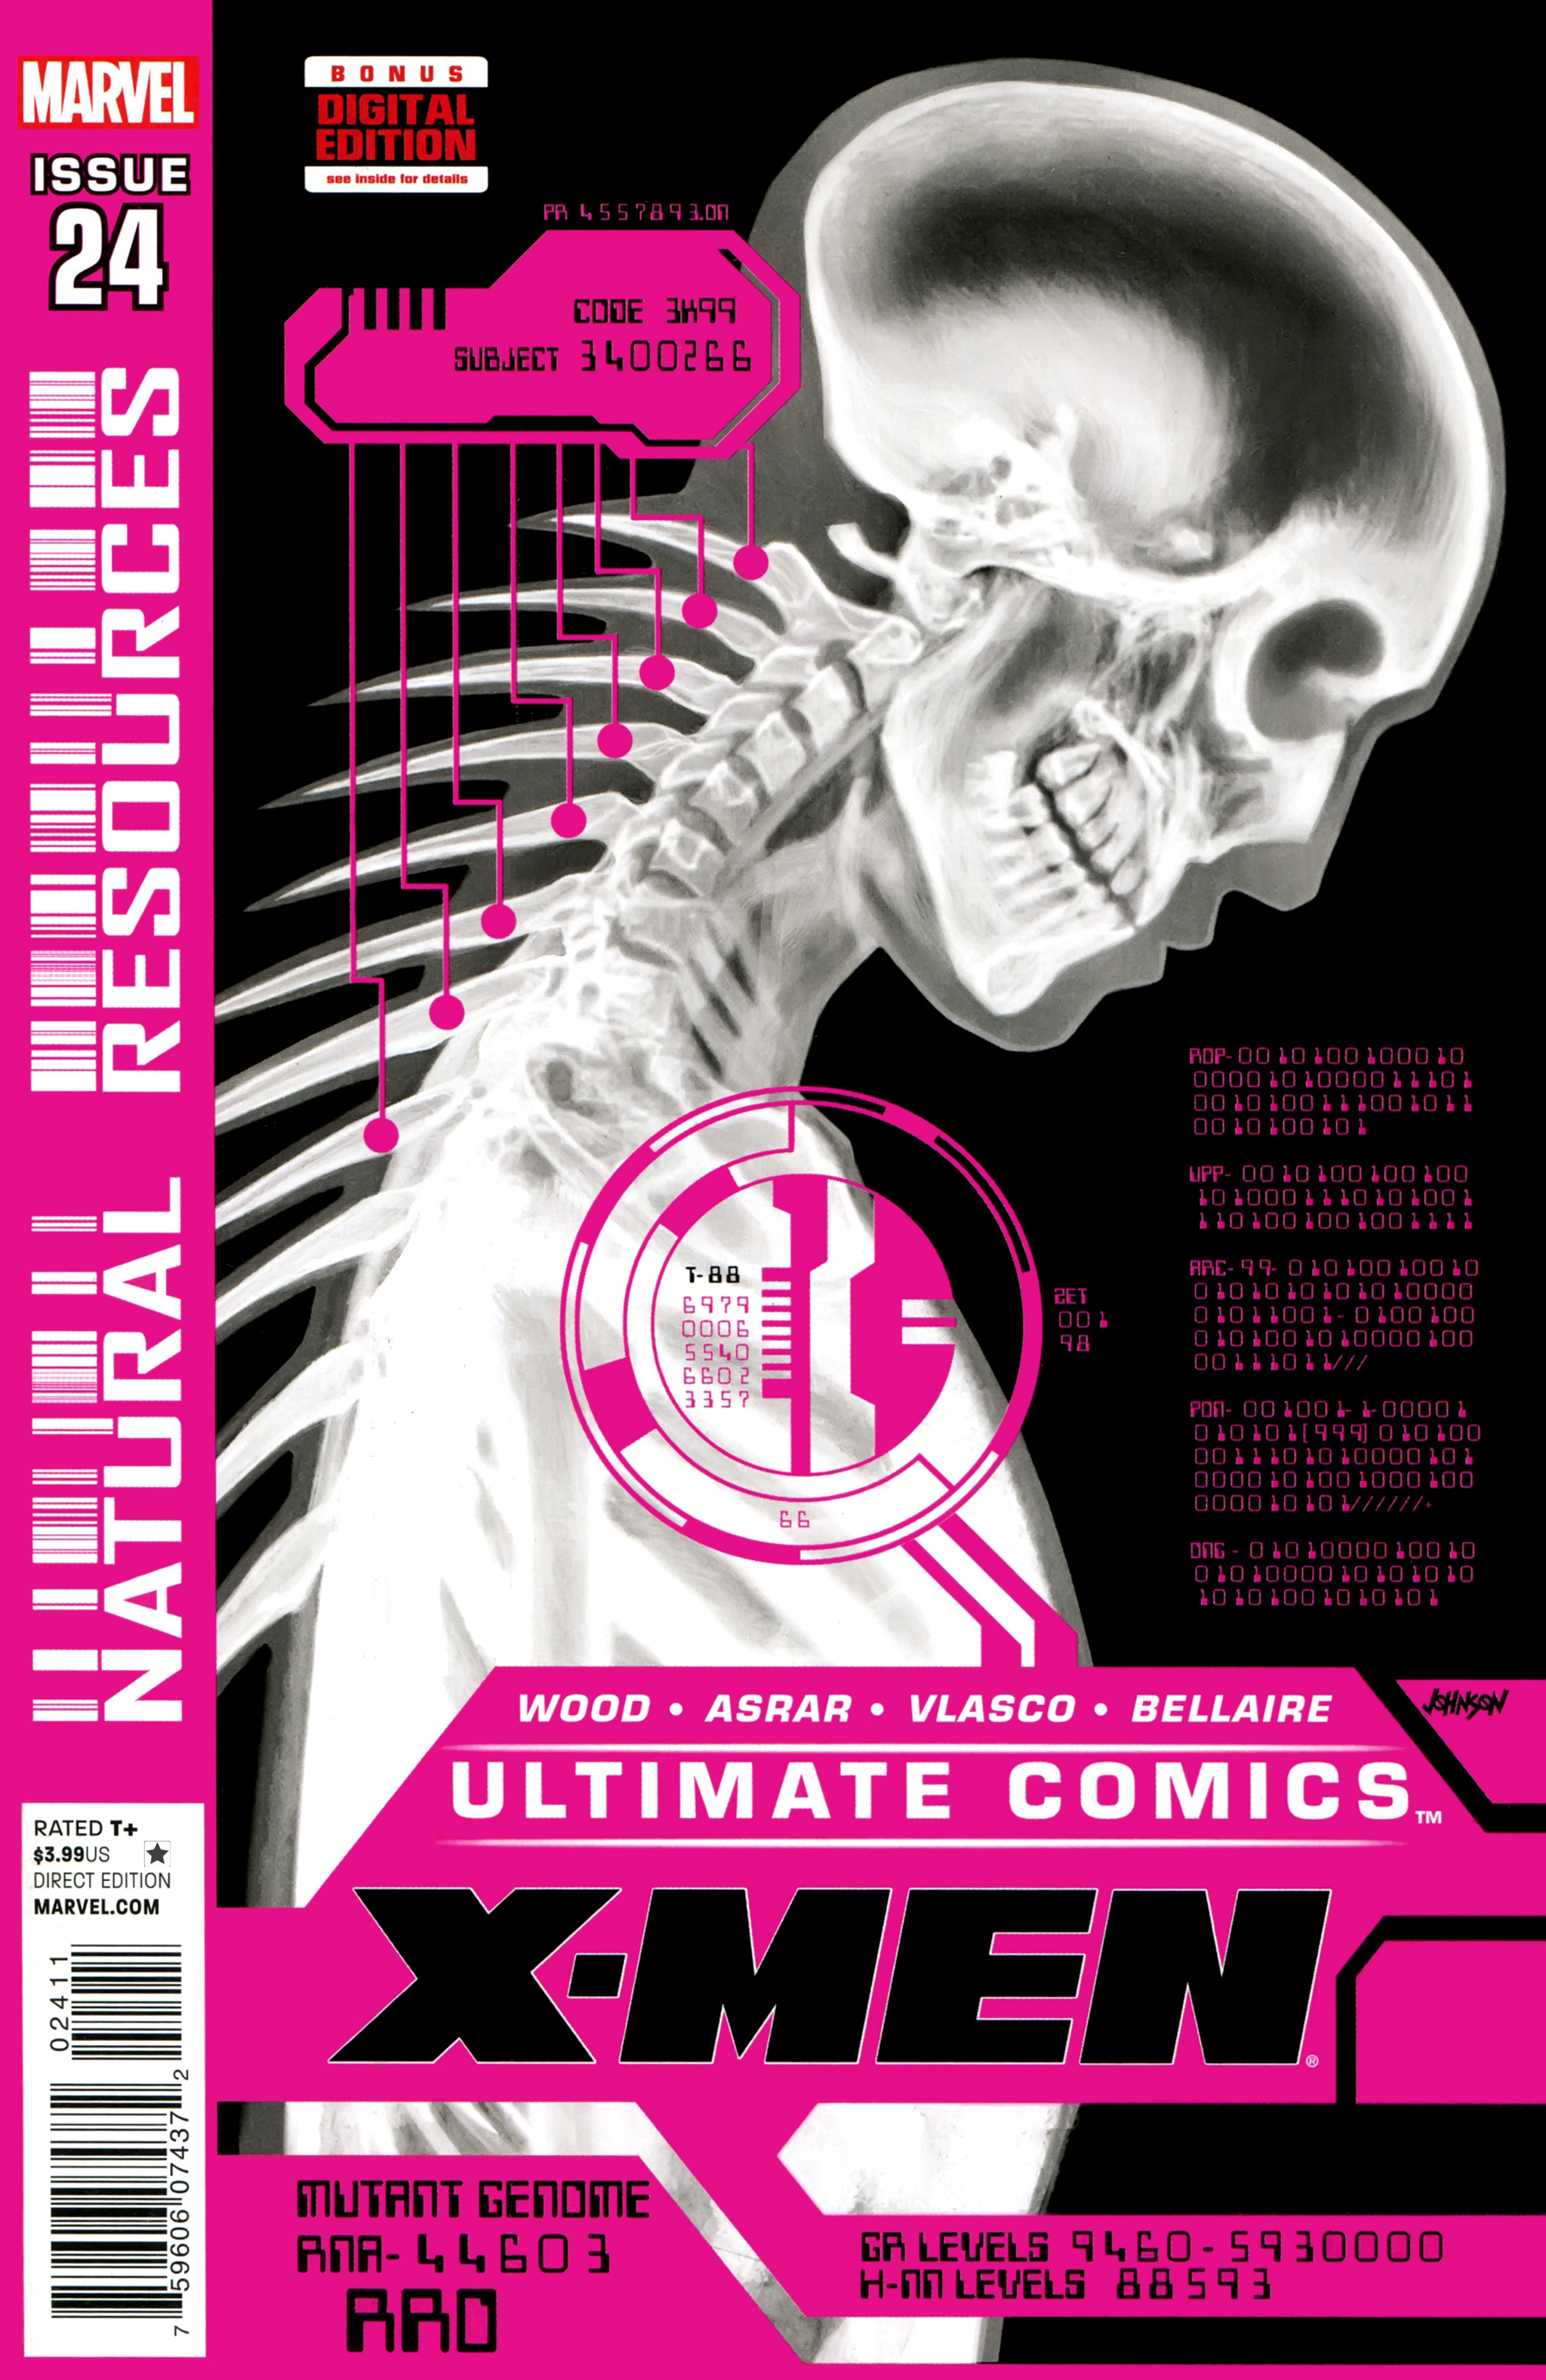 Read online Ultimate Comics X-Men comic -  Issue #24 - 1